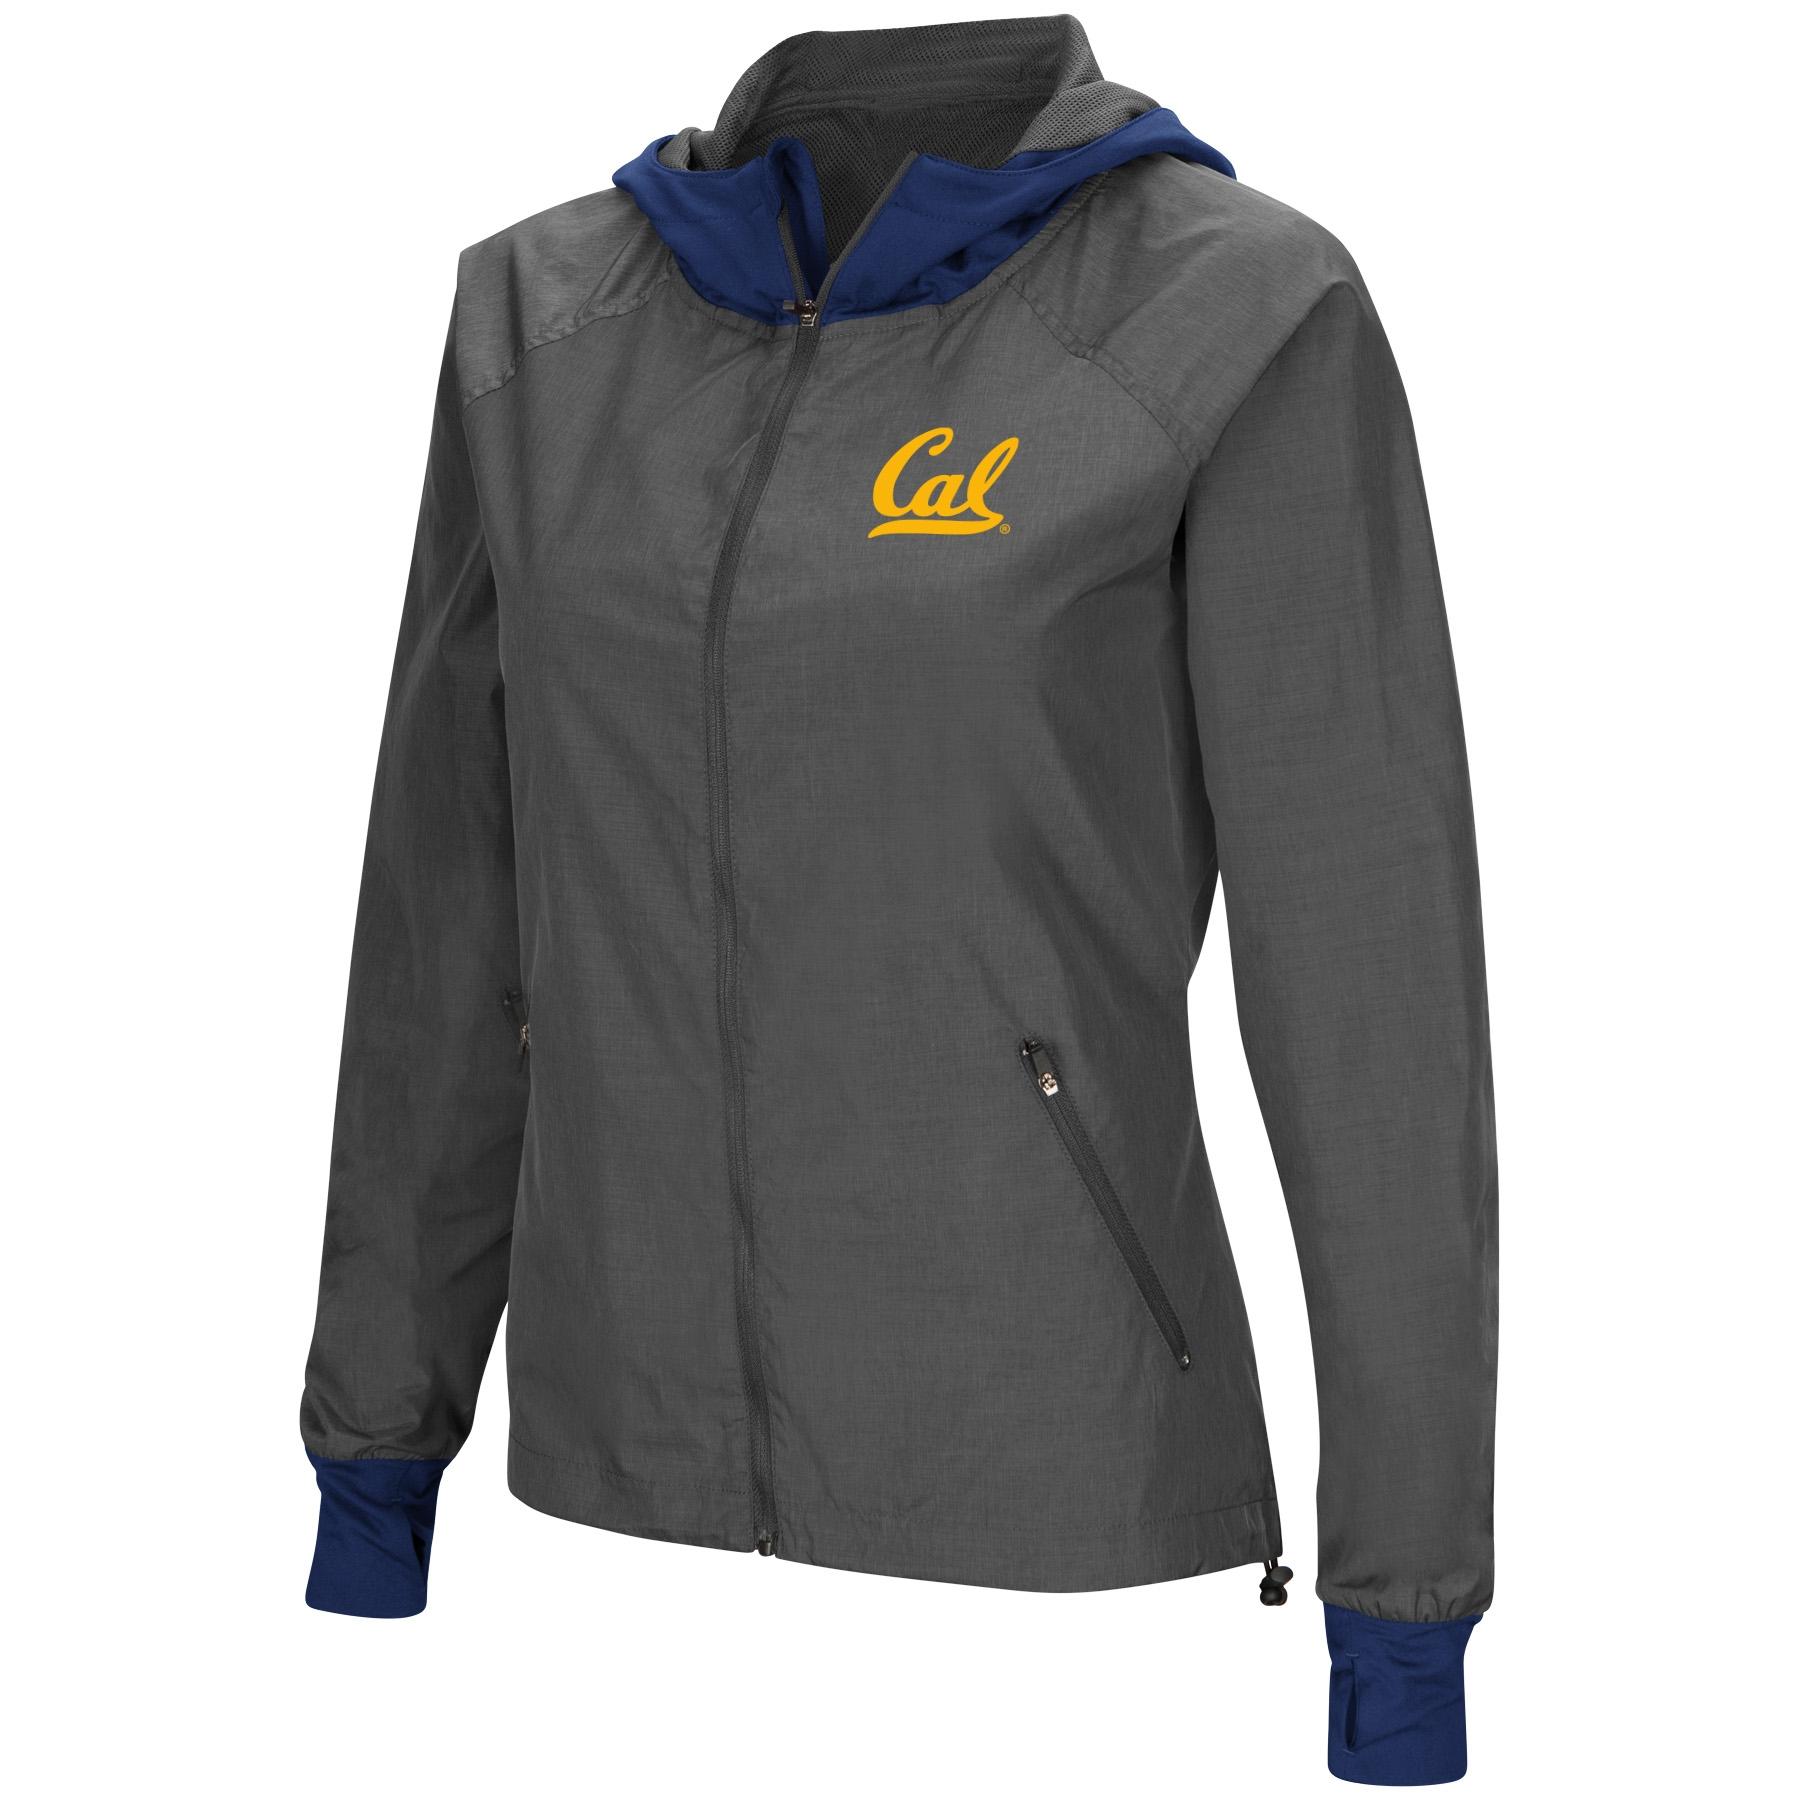 University of California Berkeley Womens Backside Hooded Jacket